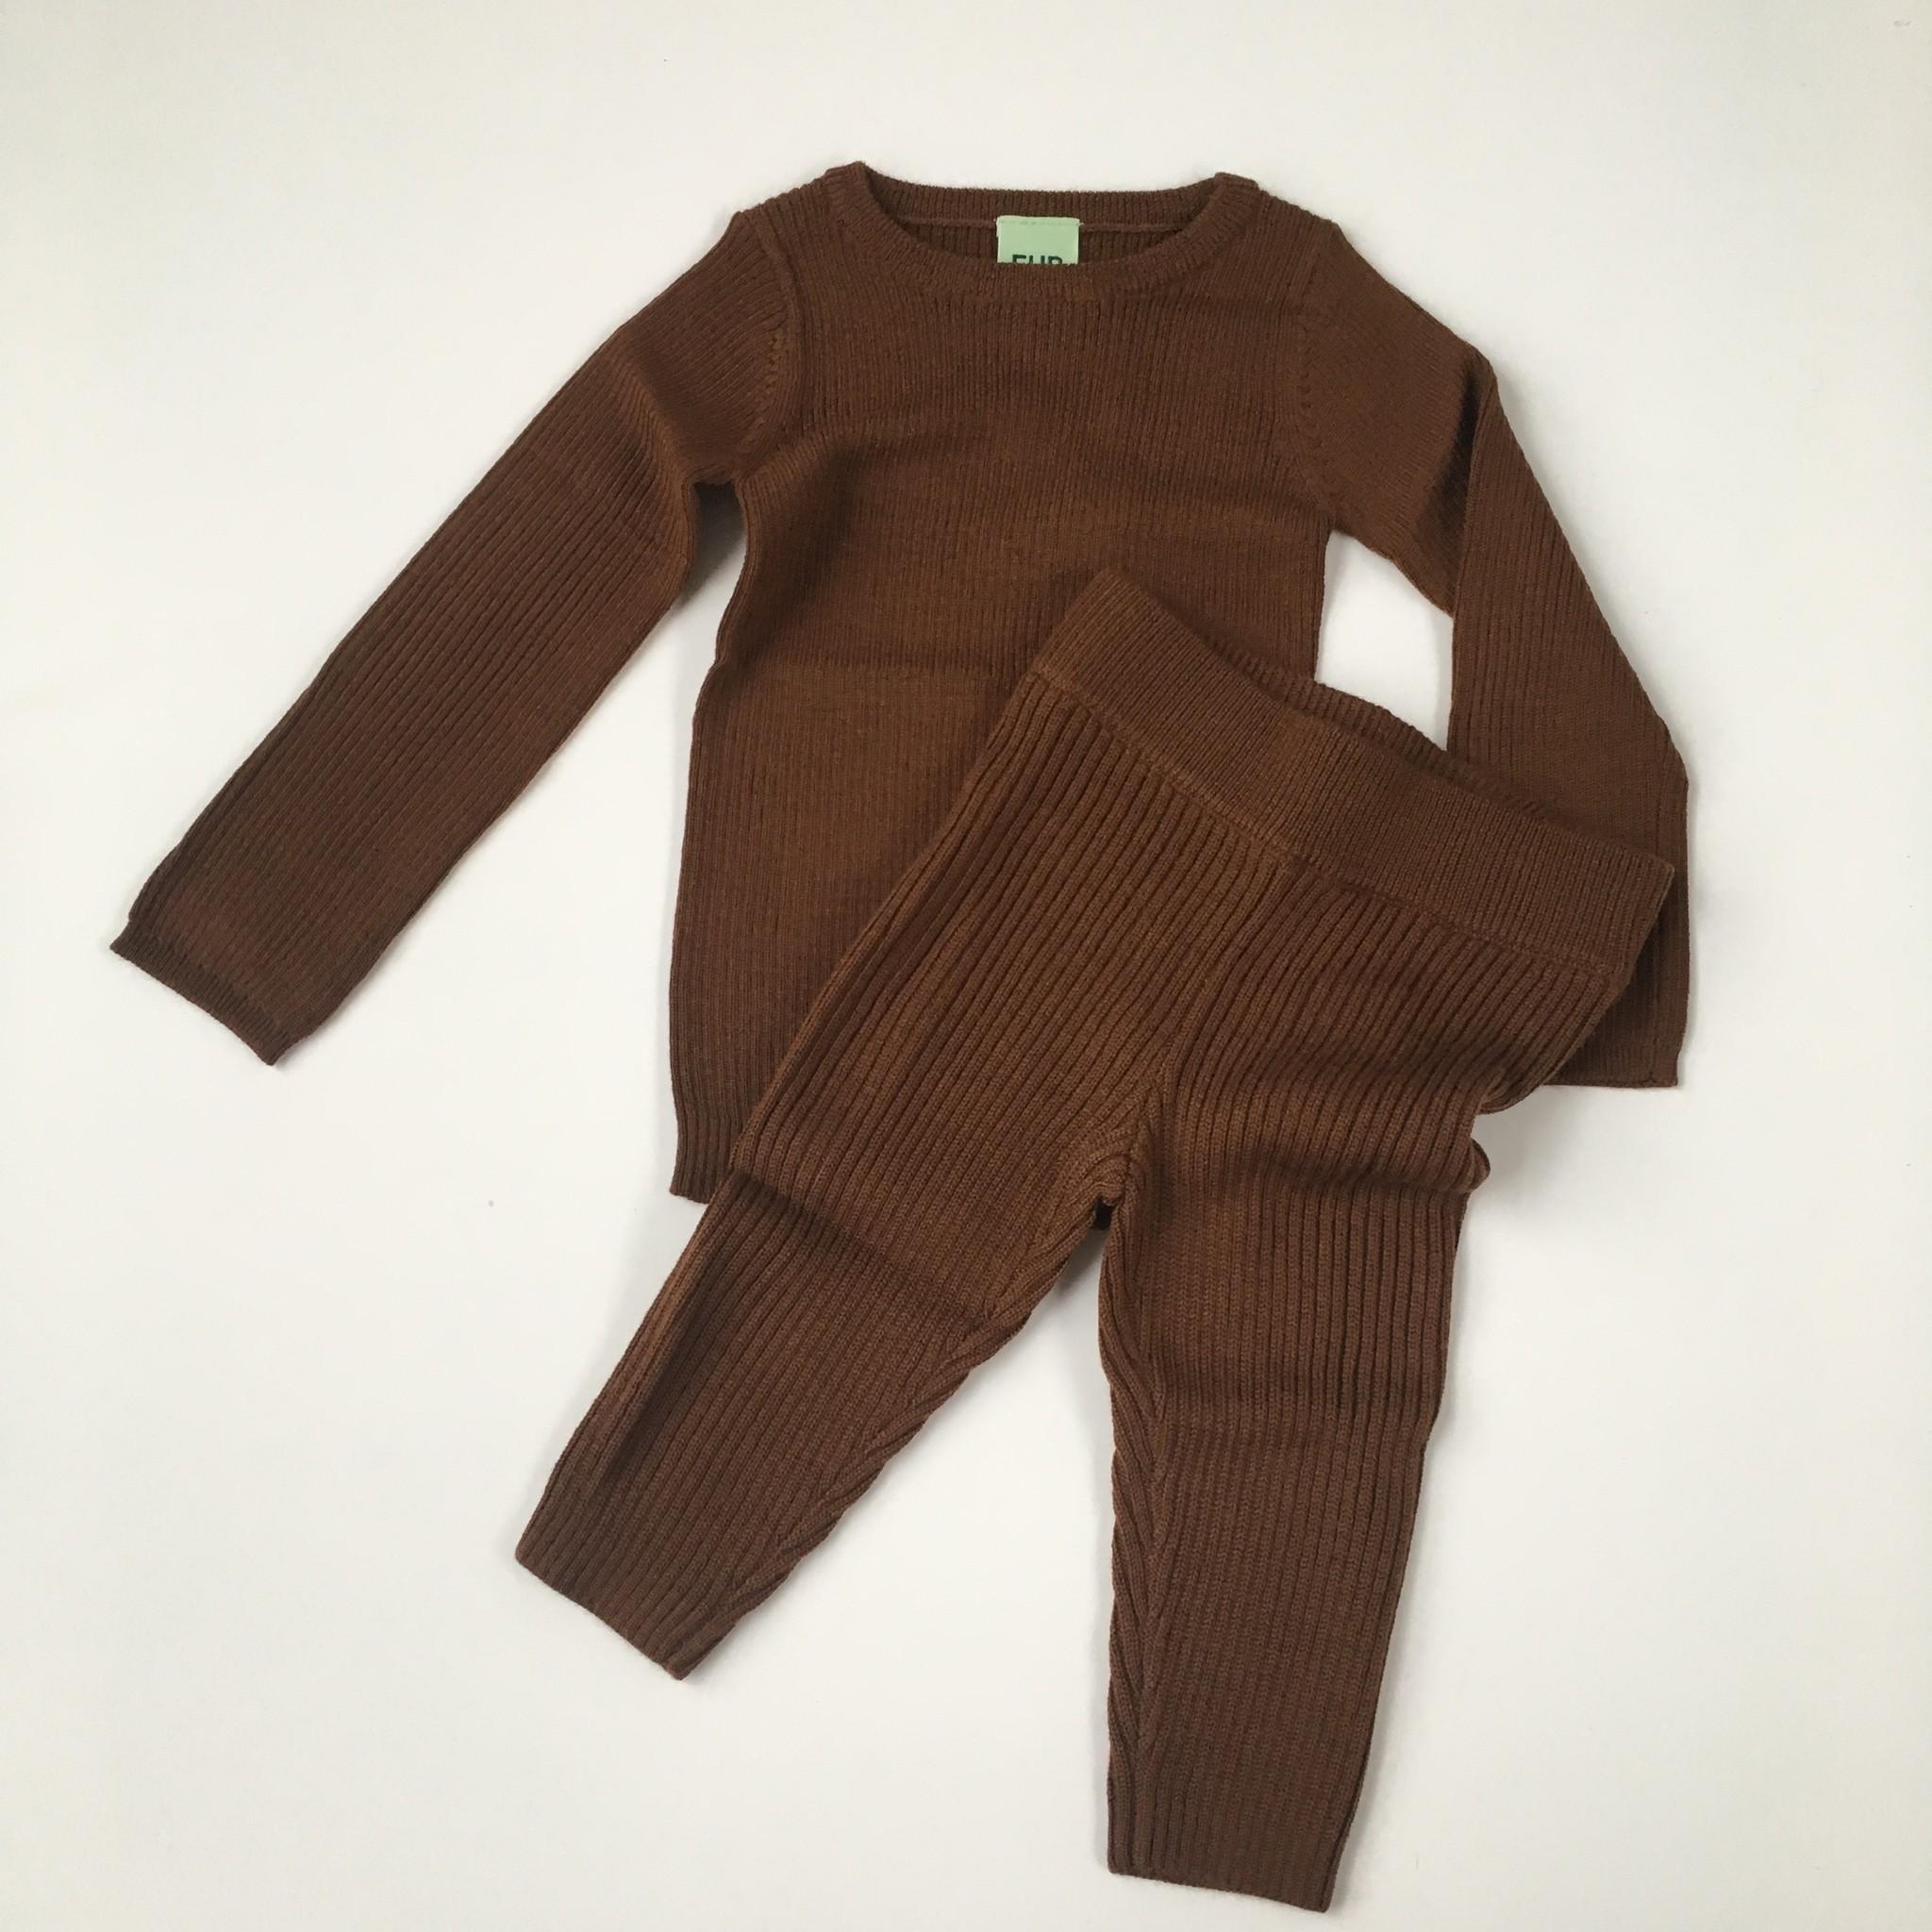 FUB wollen baby legging - fijngebreid 100% merino - umber bruin - 56 tm 80